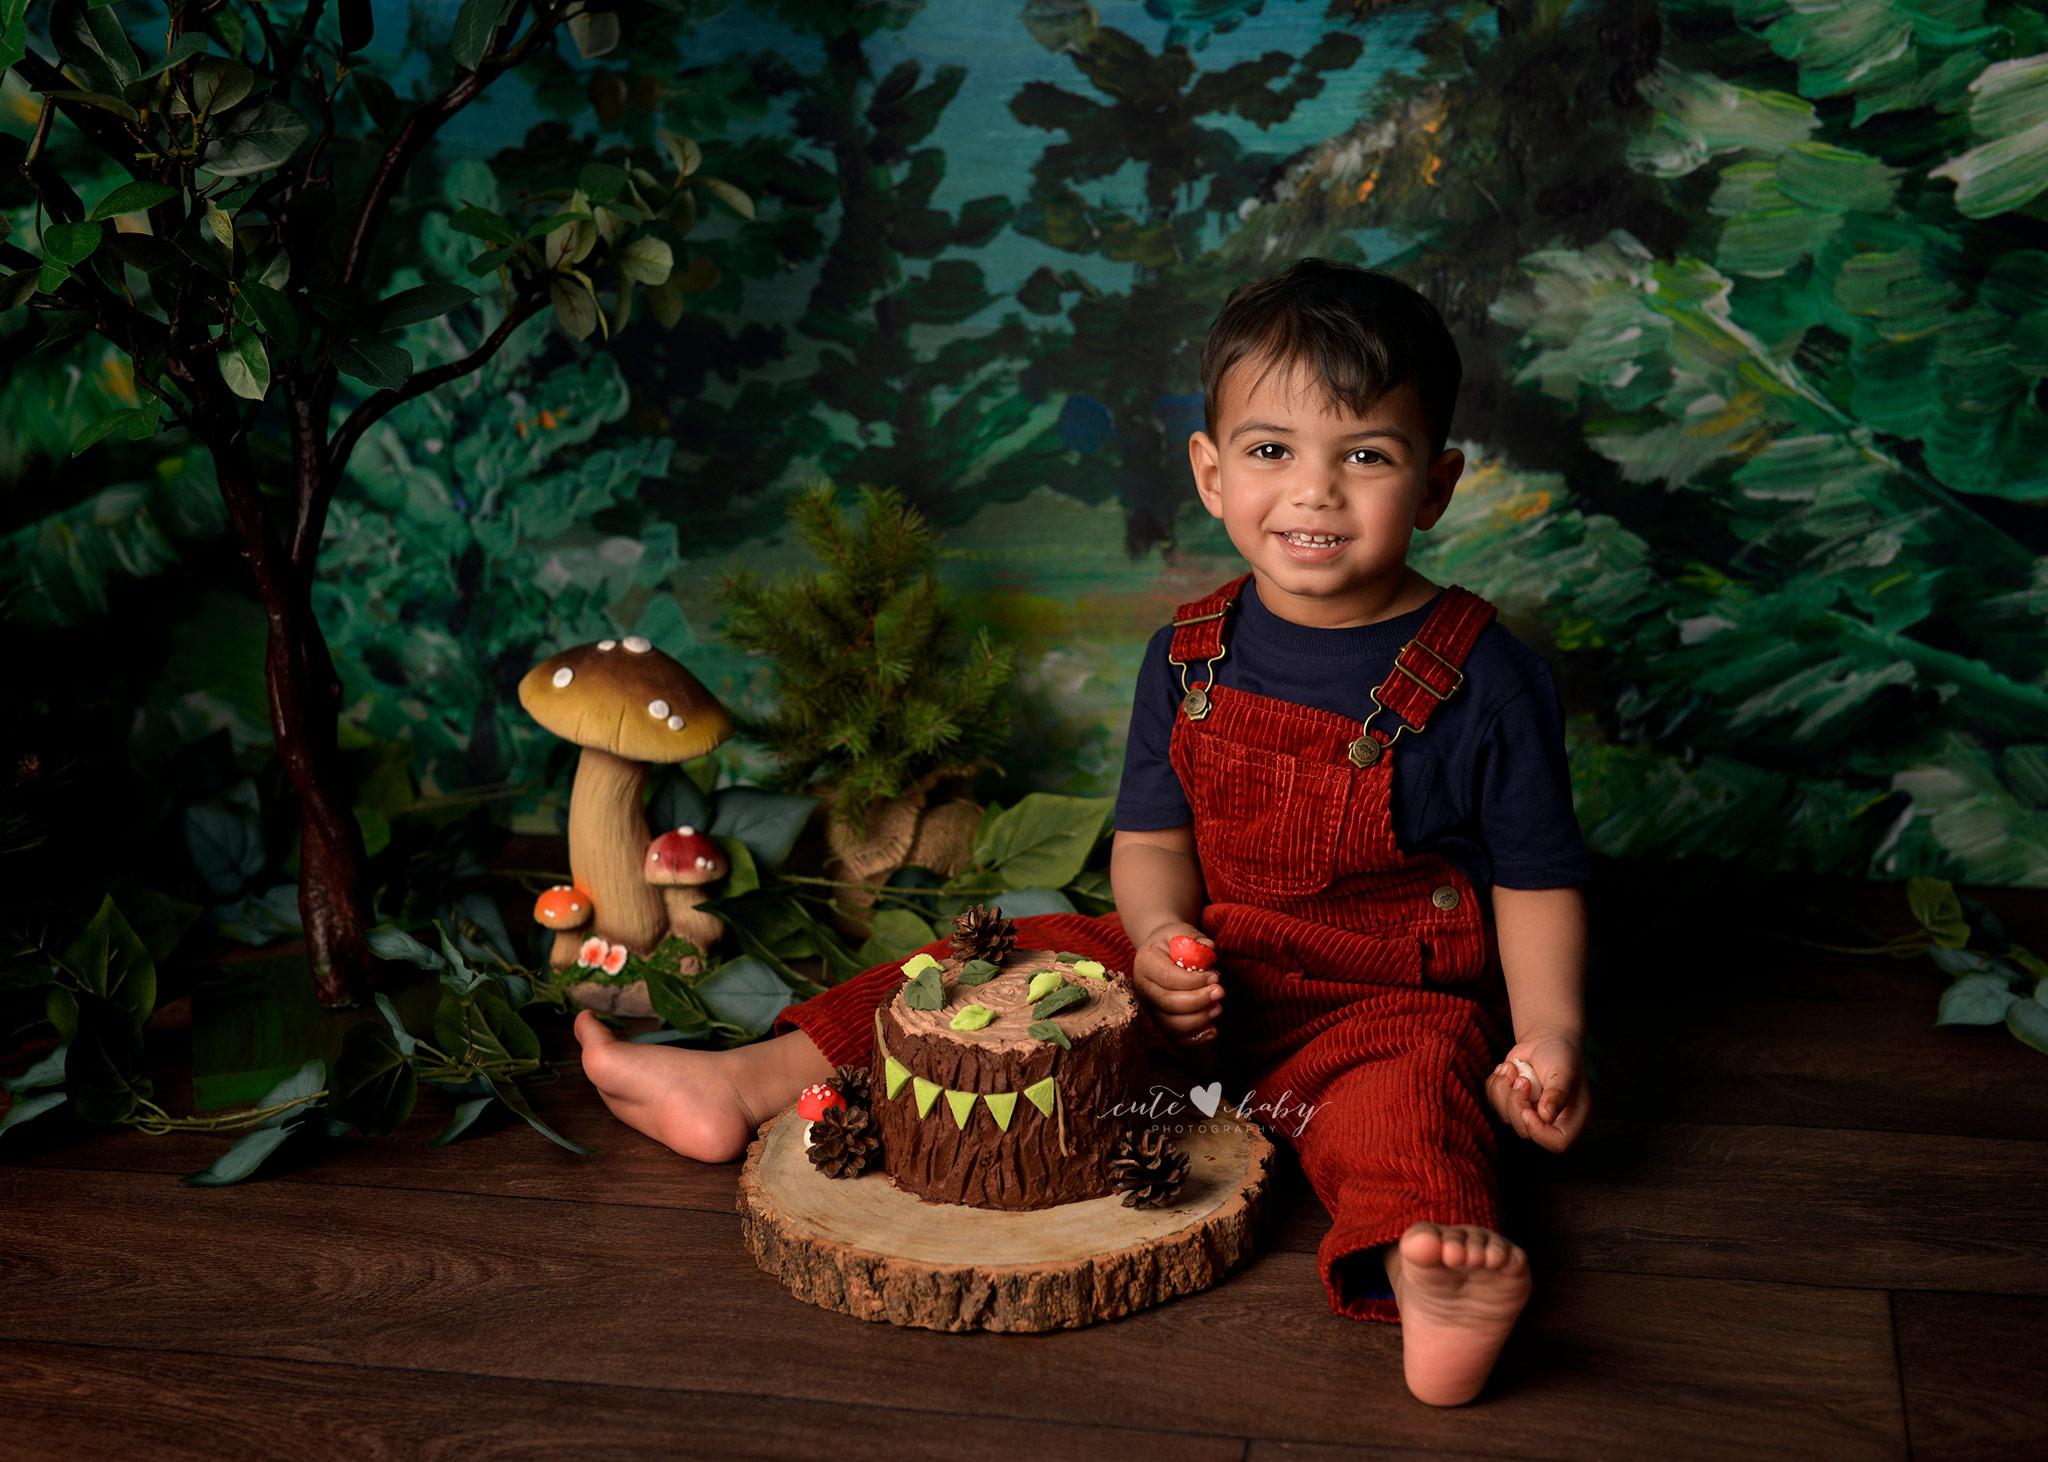 cake smash Manchester, Baby Photography Manchester, 1st Birthday photography, Cake Smash Camping